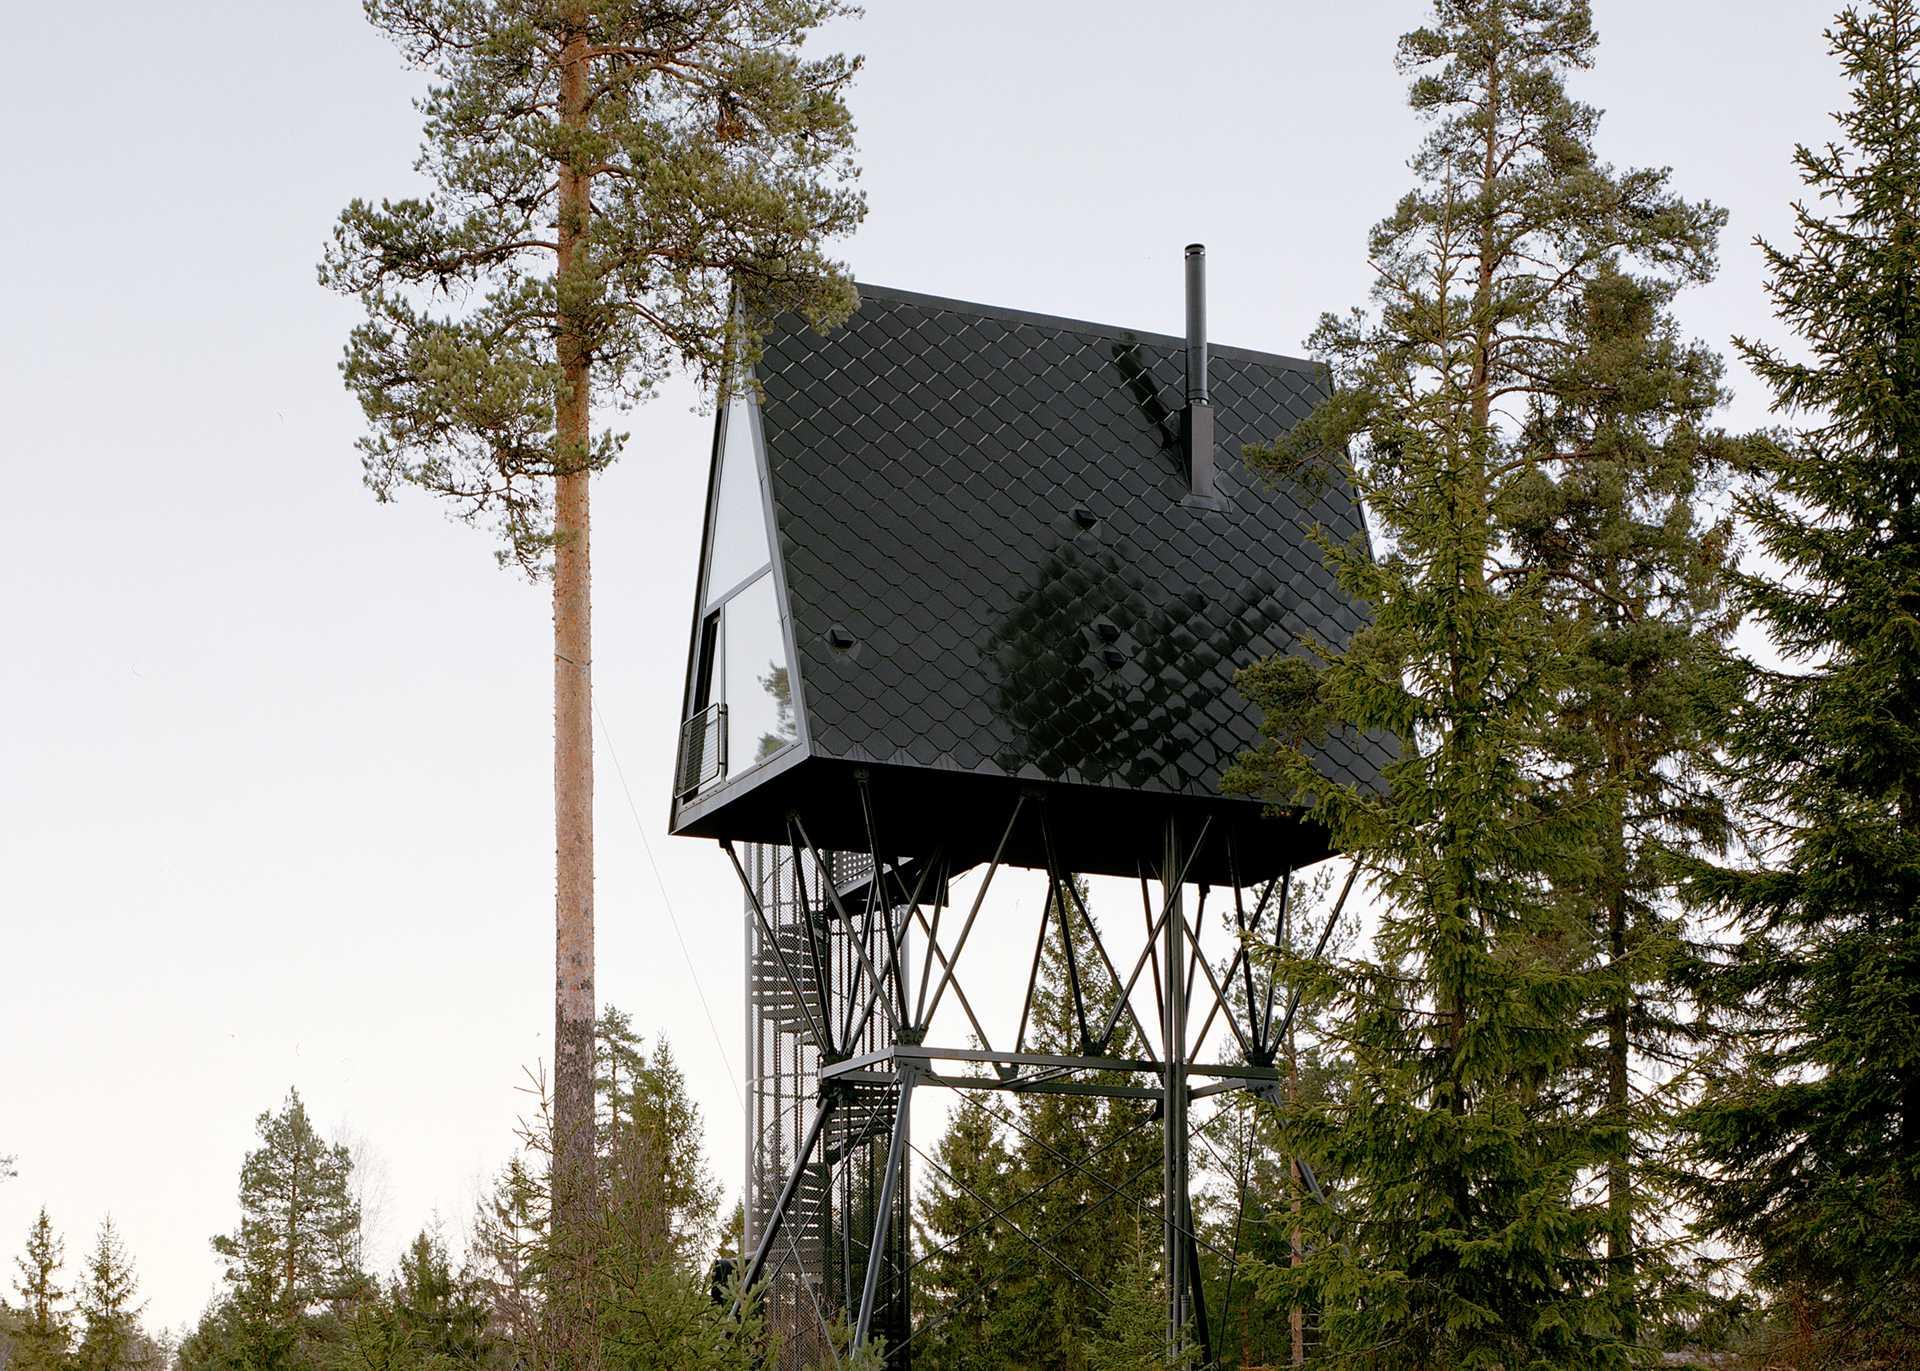 PAN-cabins  - 22 2.2 39